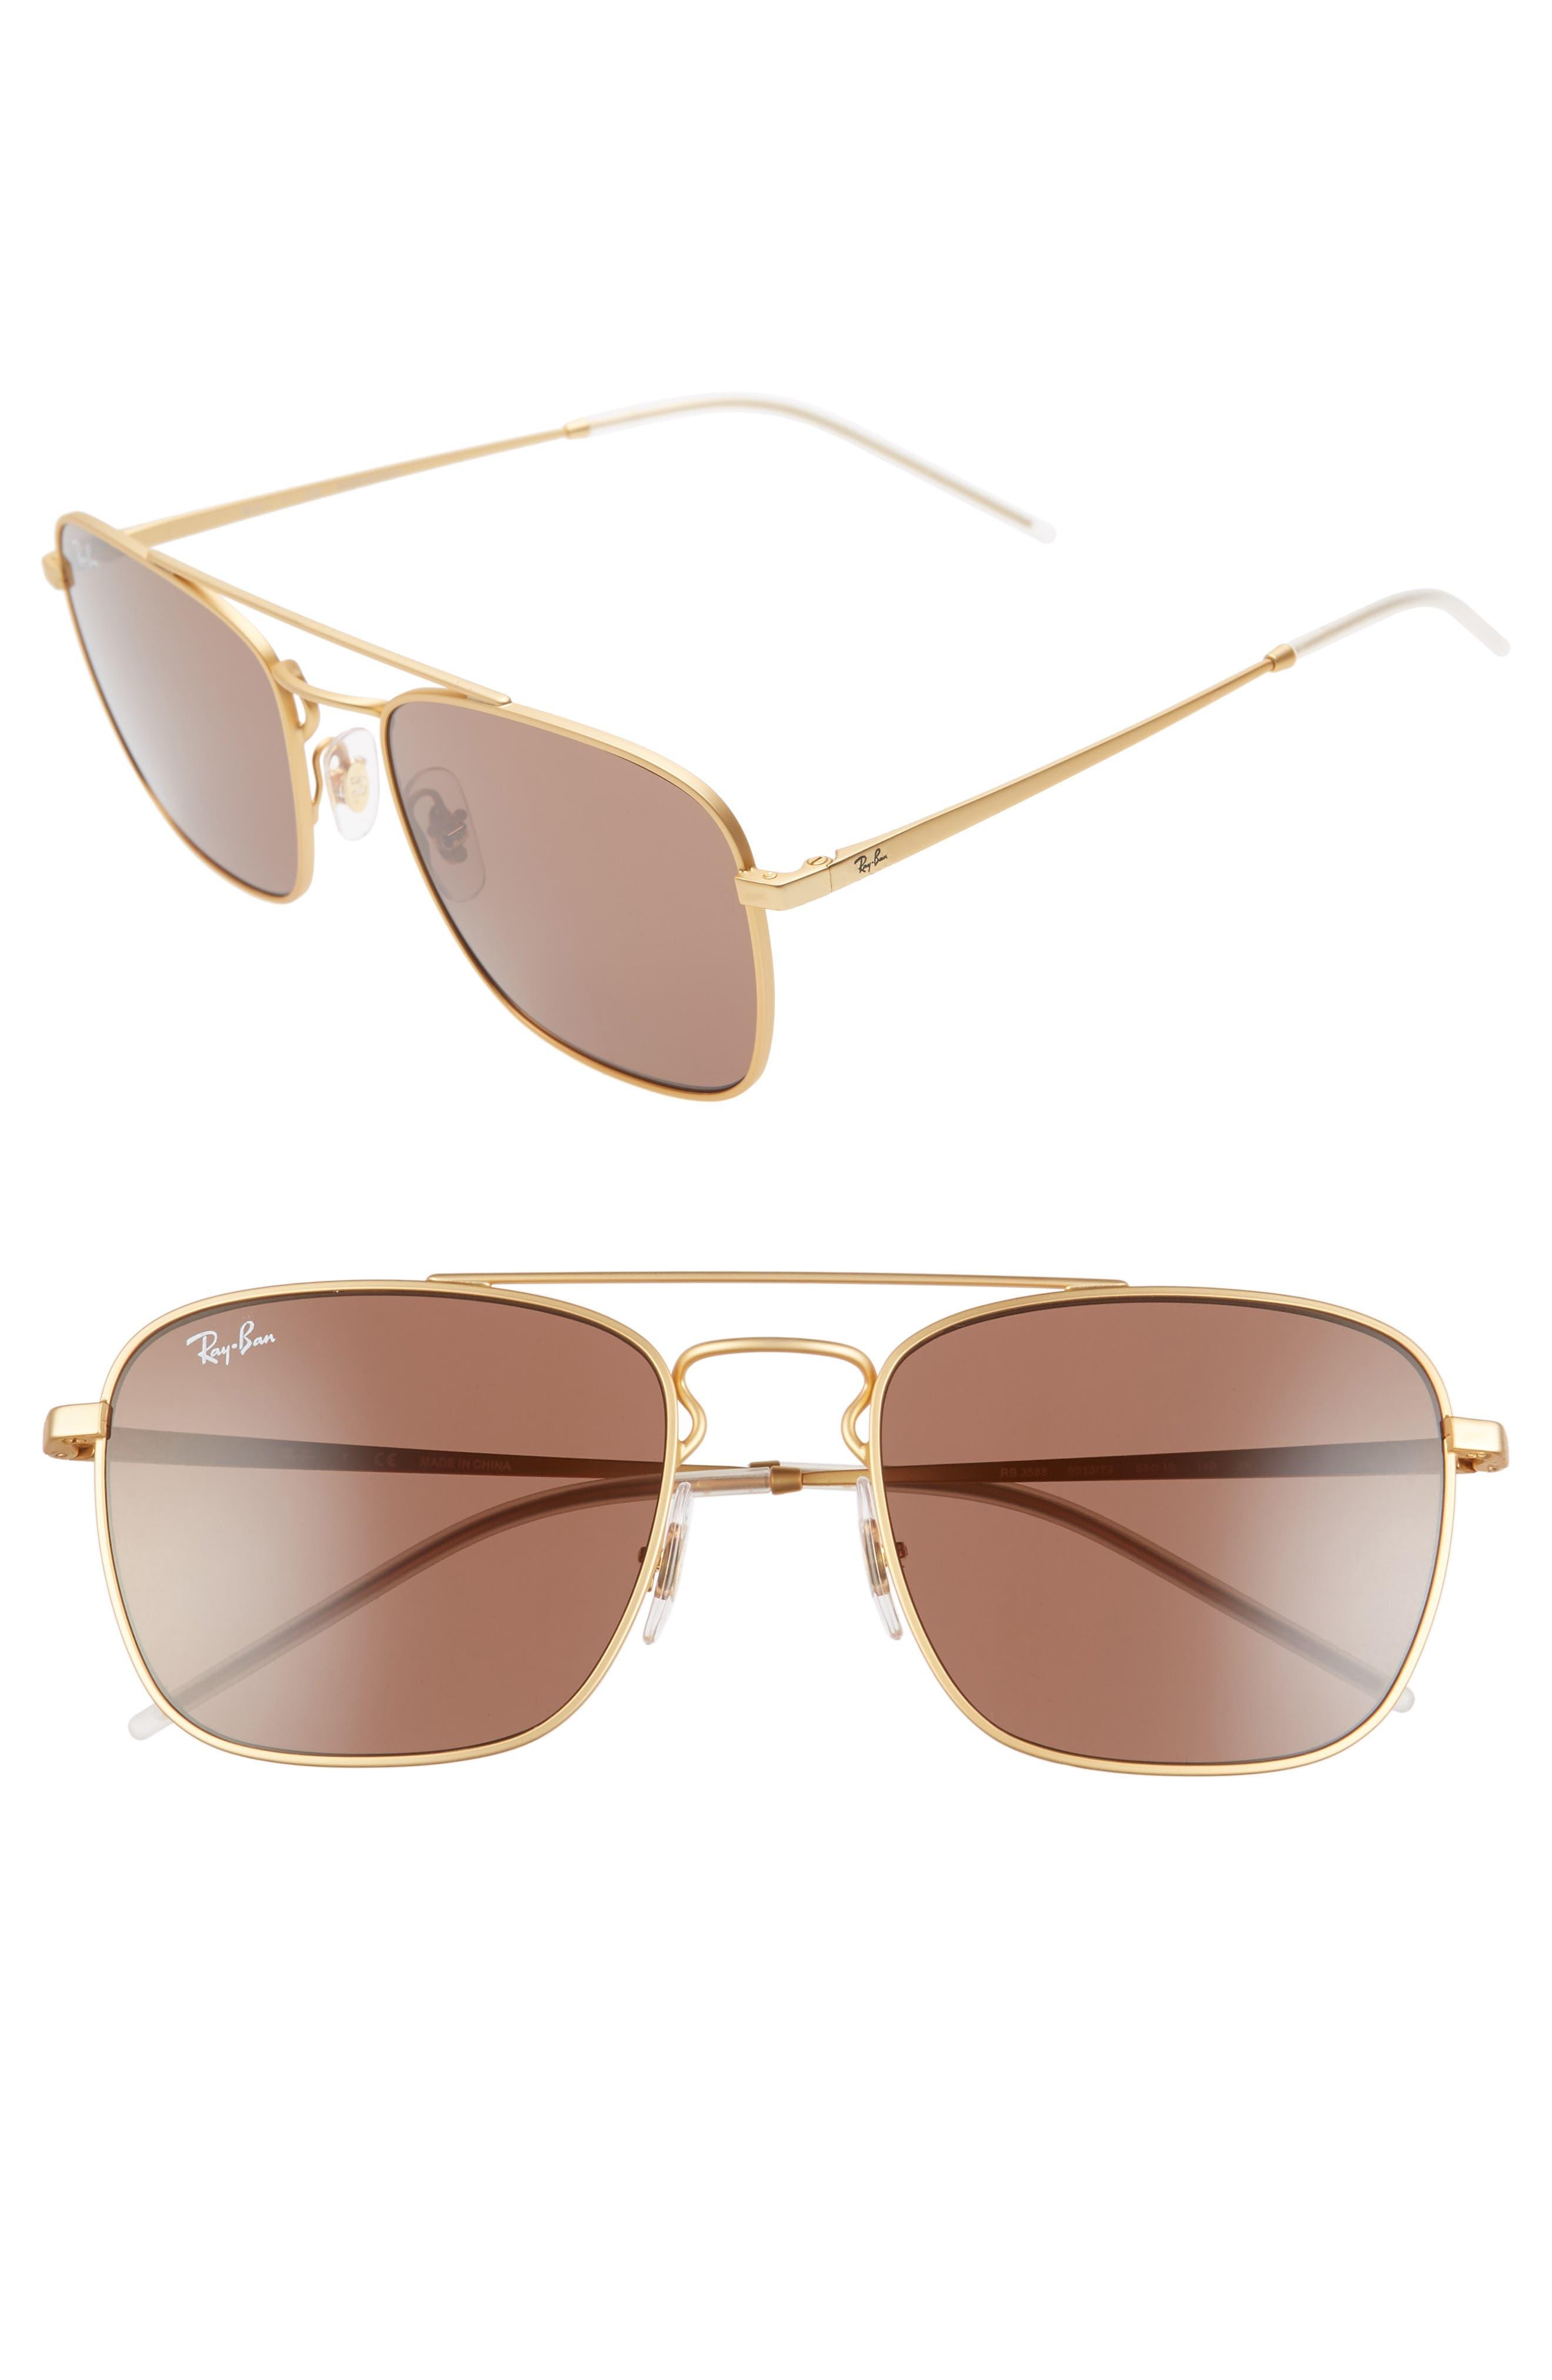 Ray-Ban 55Mm Square Sunglasses -